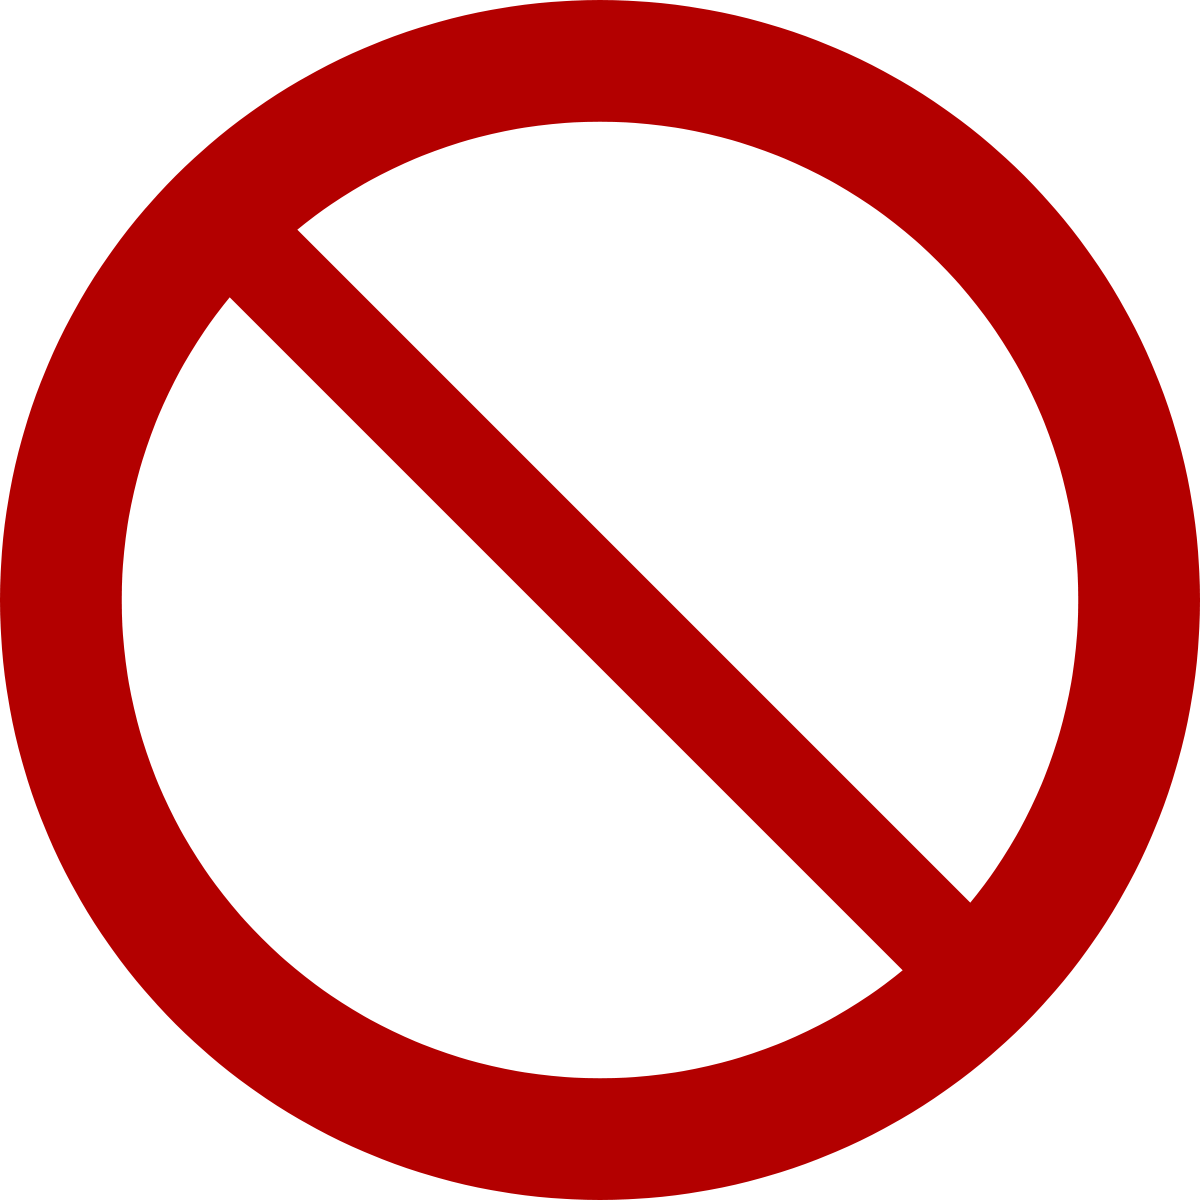 No symbol.